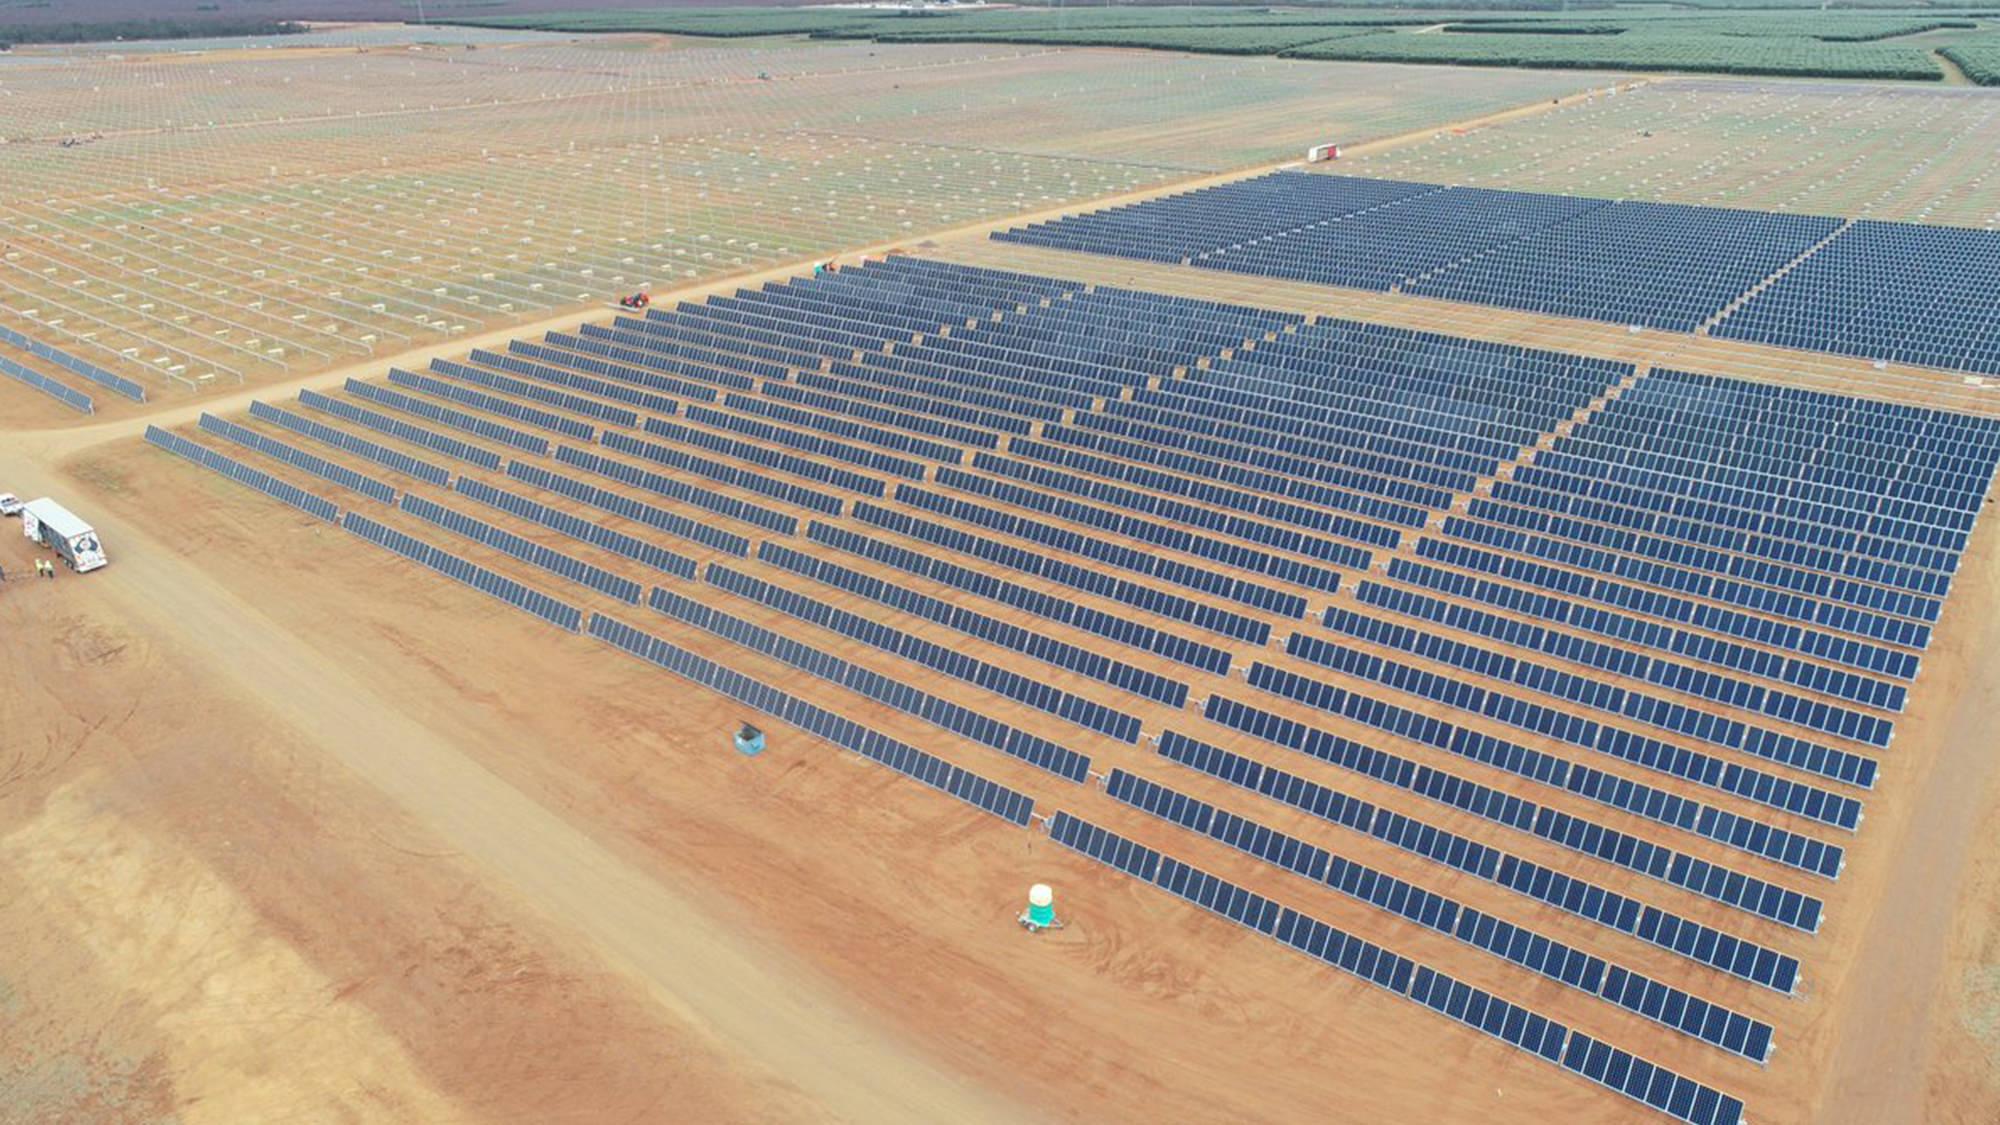 wemen-solar-farm-project-image